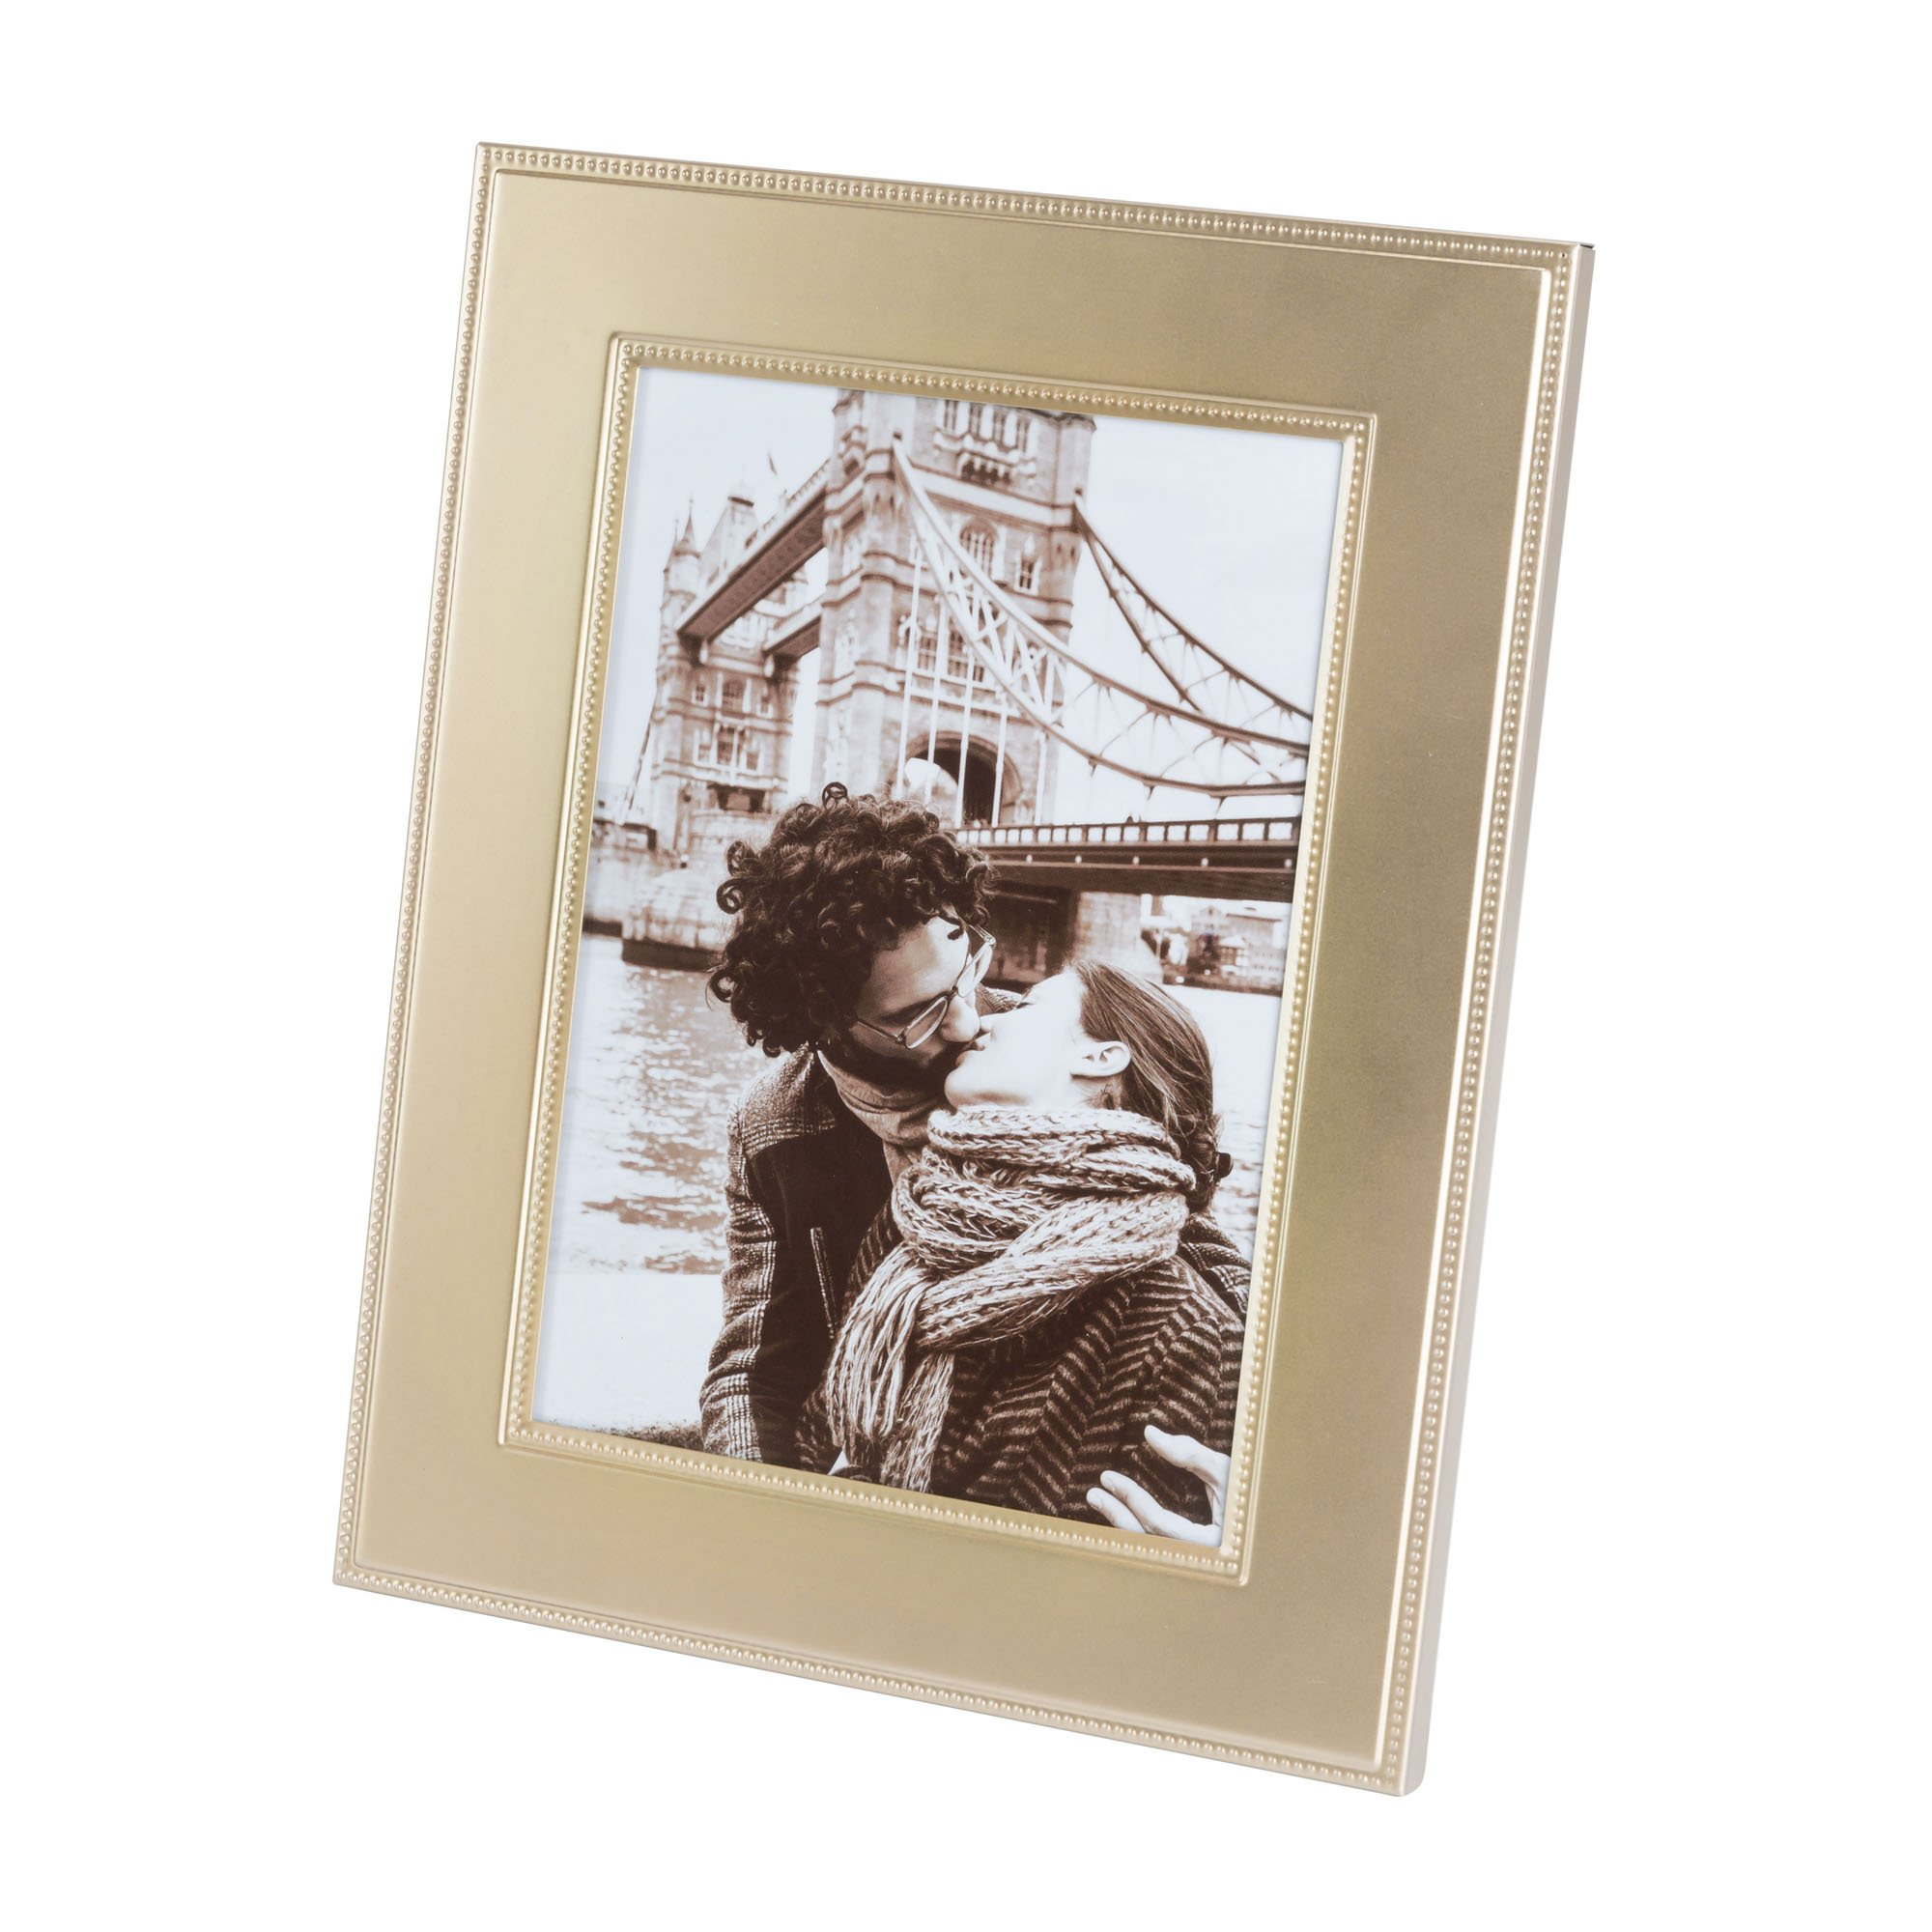 Elegance Matte Finish Beaded Design Picture Frame, 5X7, Gold